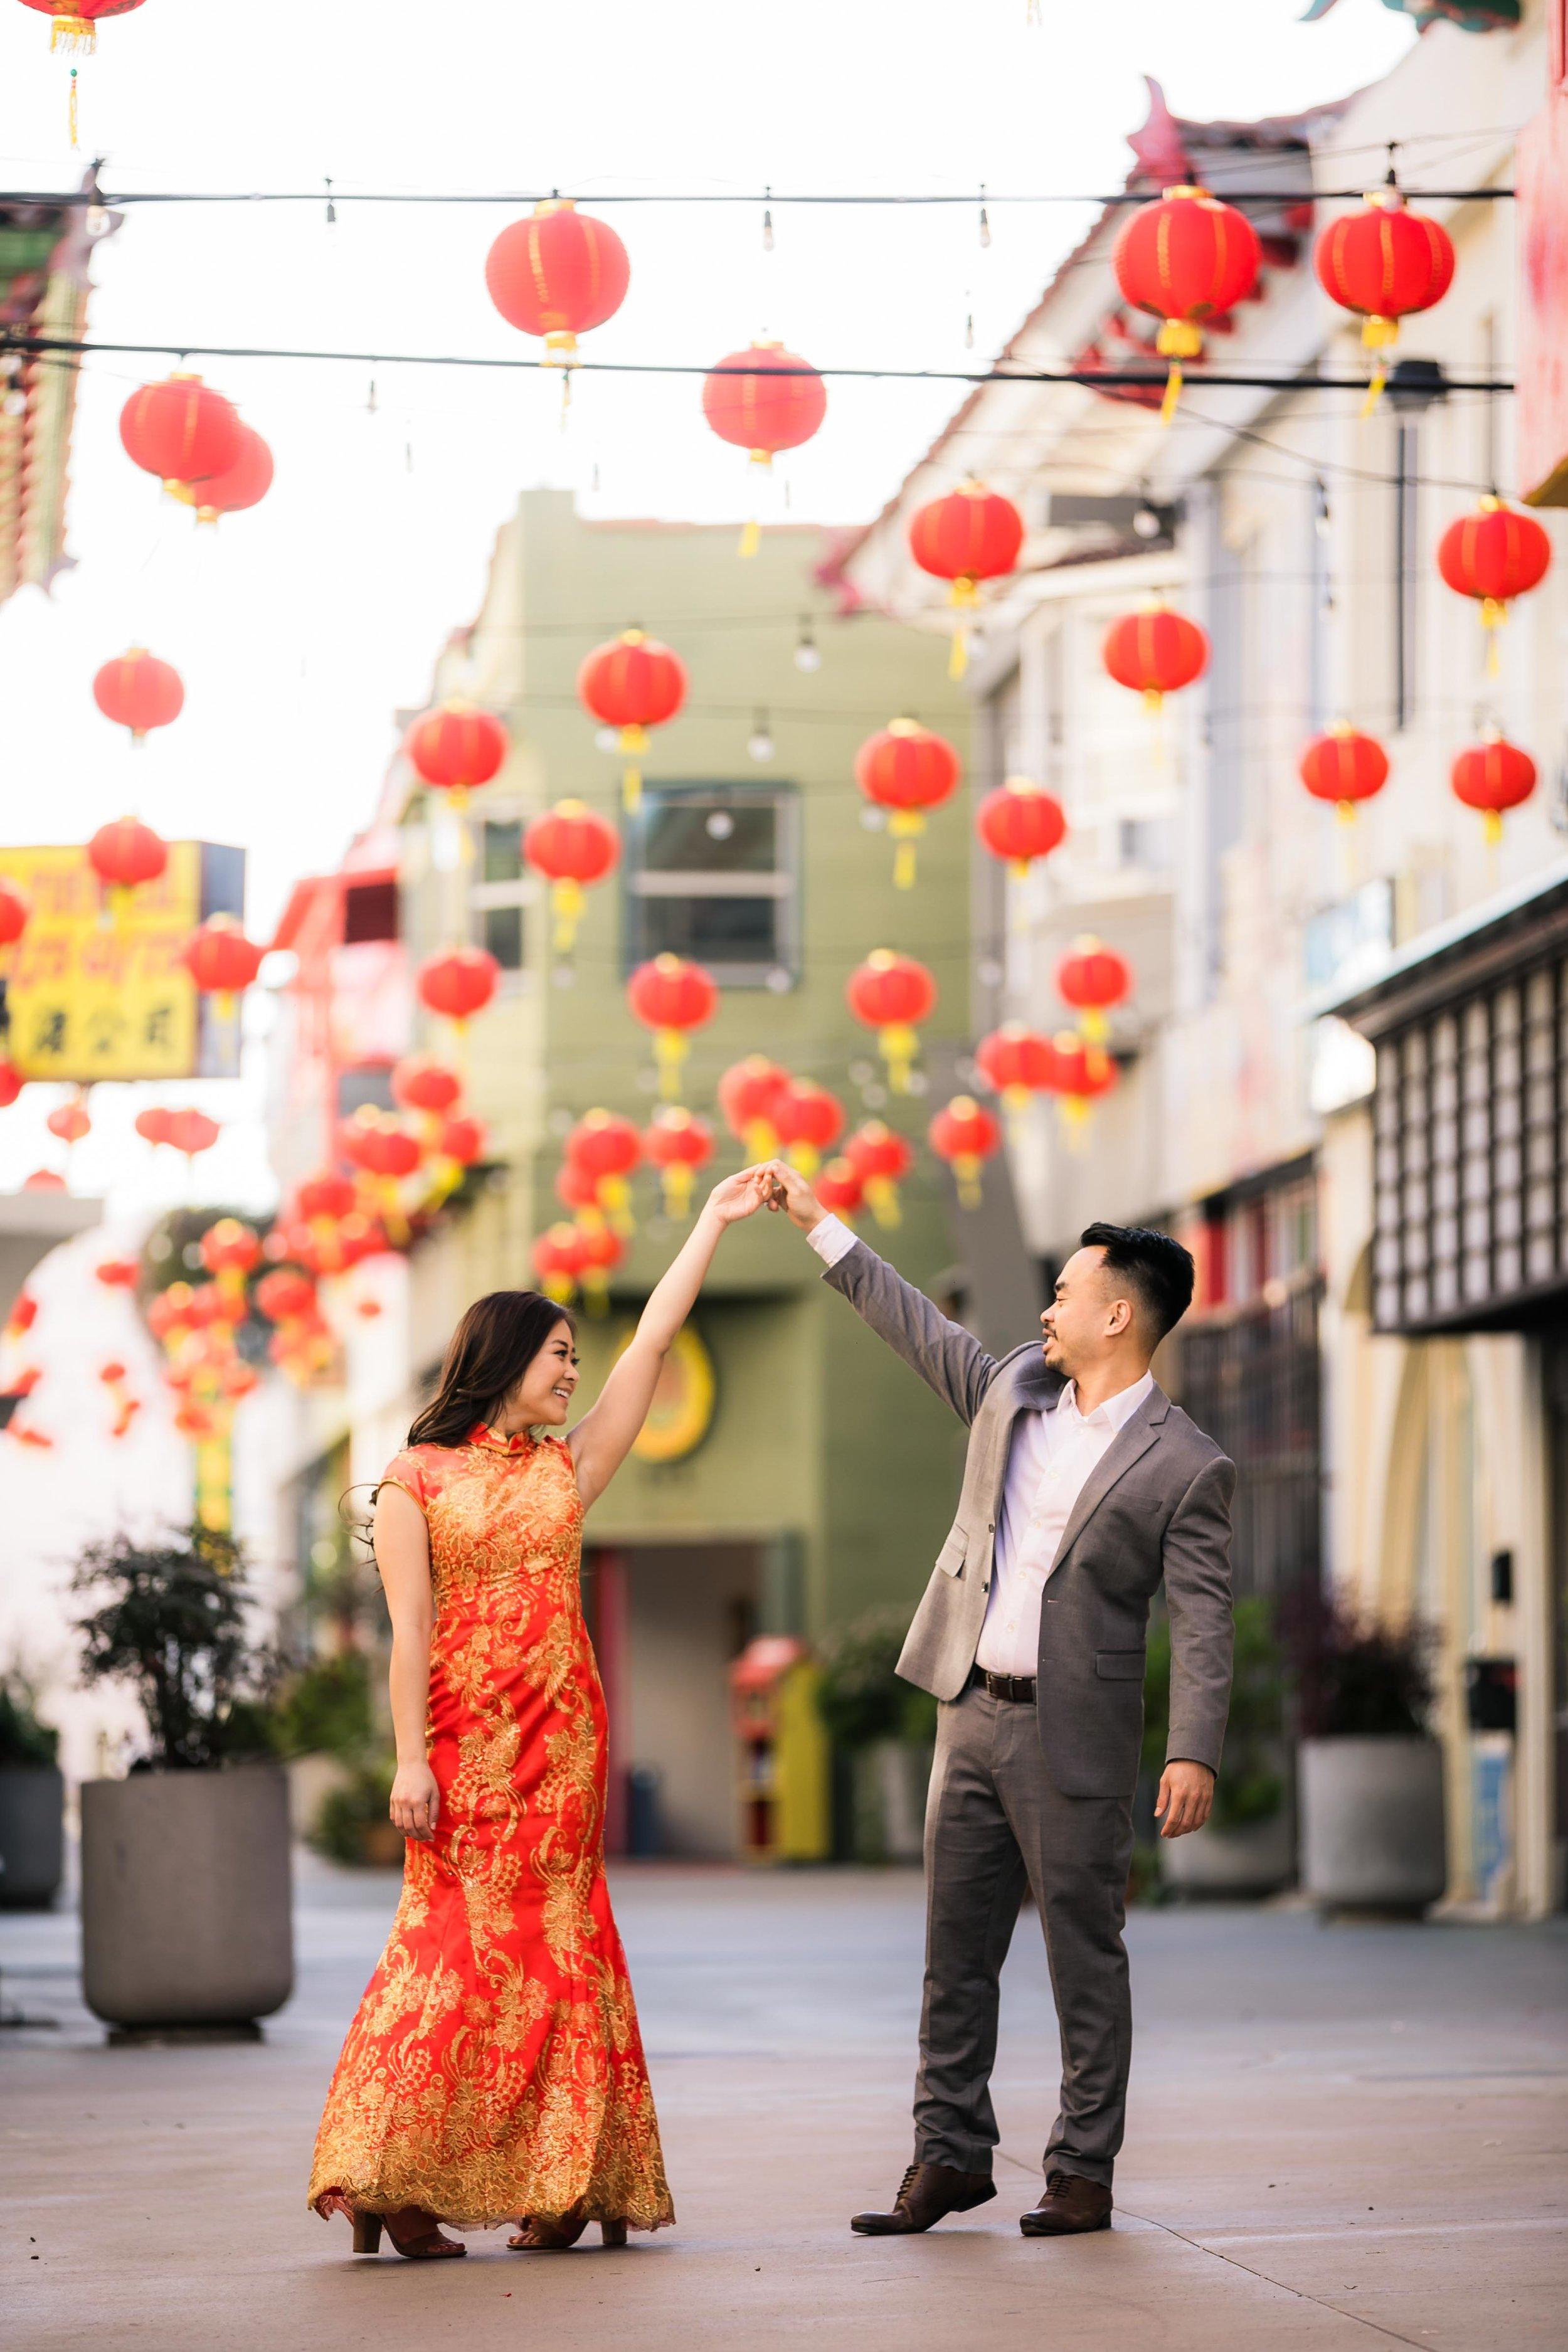 chinese_los_angeles_california_wedding_joshuachun_photography-3.JPG